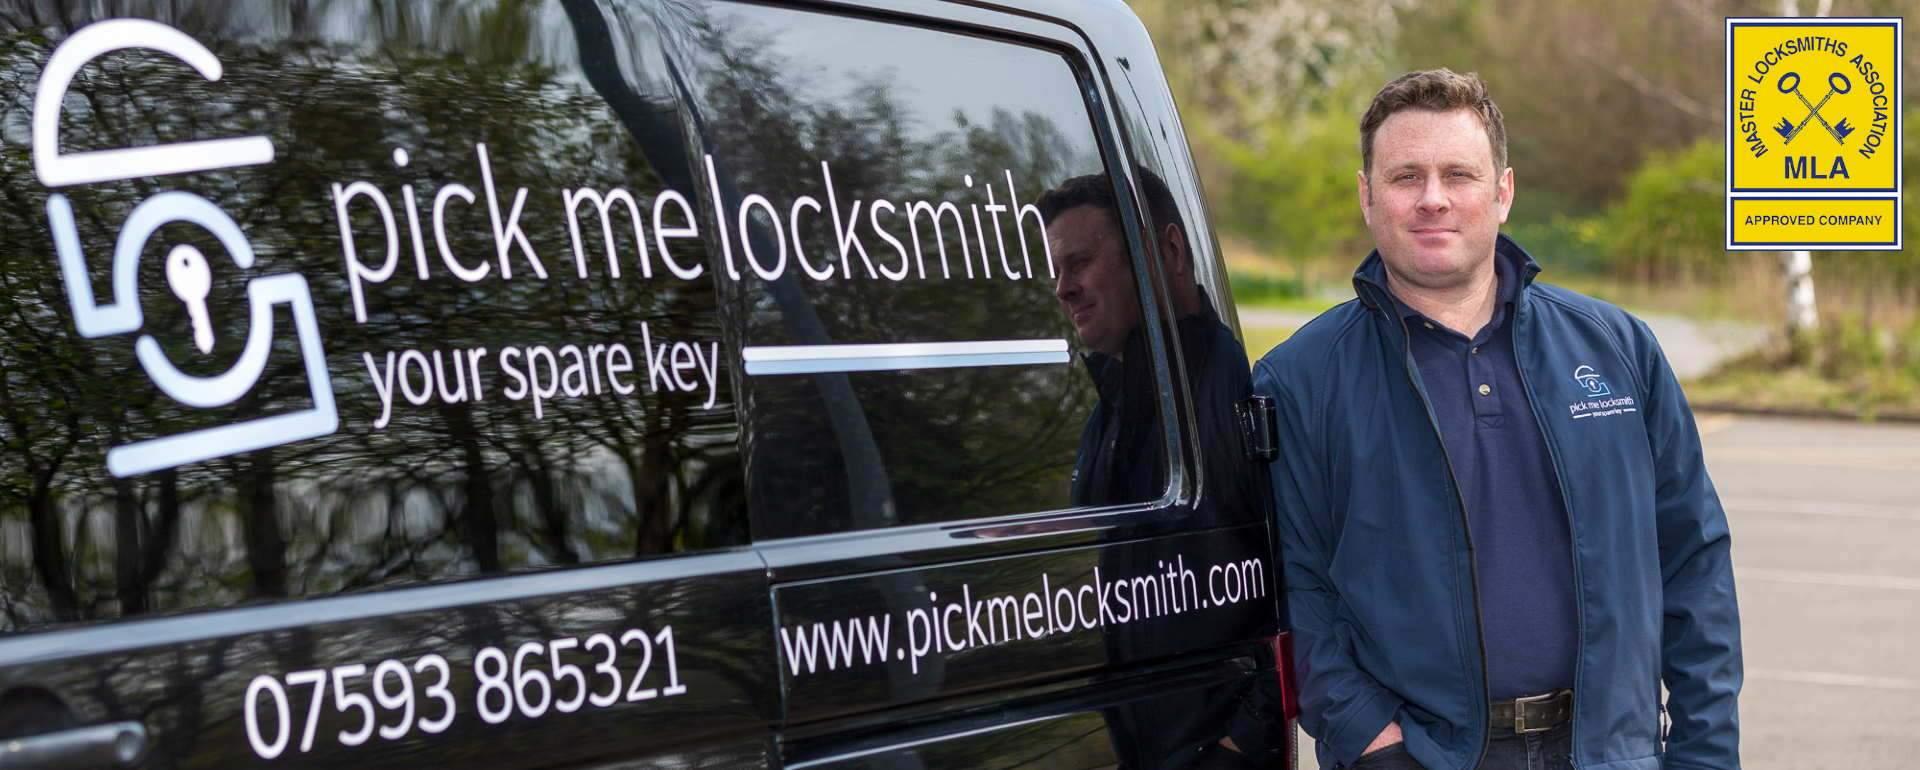 Mark Santi - Master Locksmith Derby by his Locksmiths Van